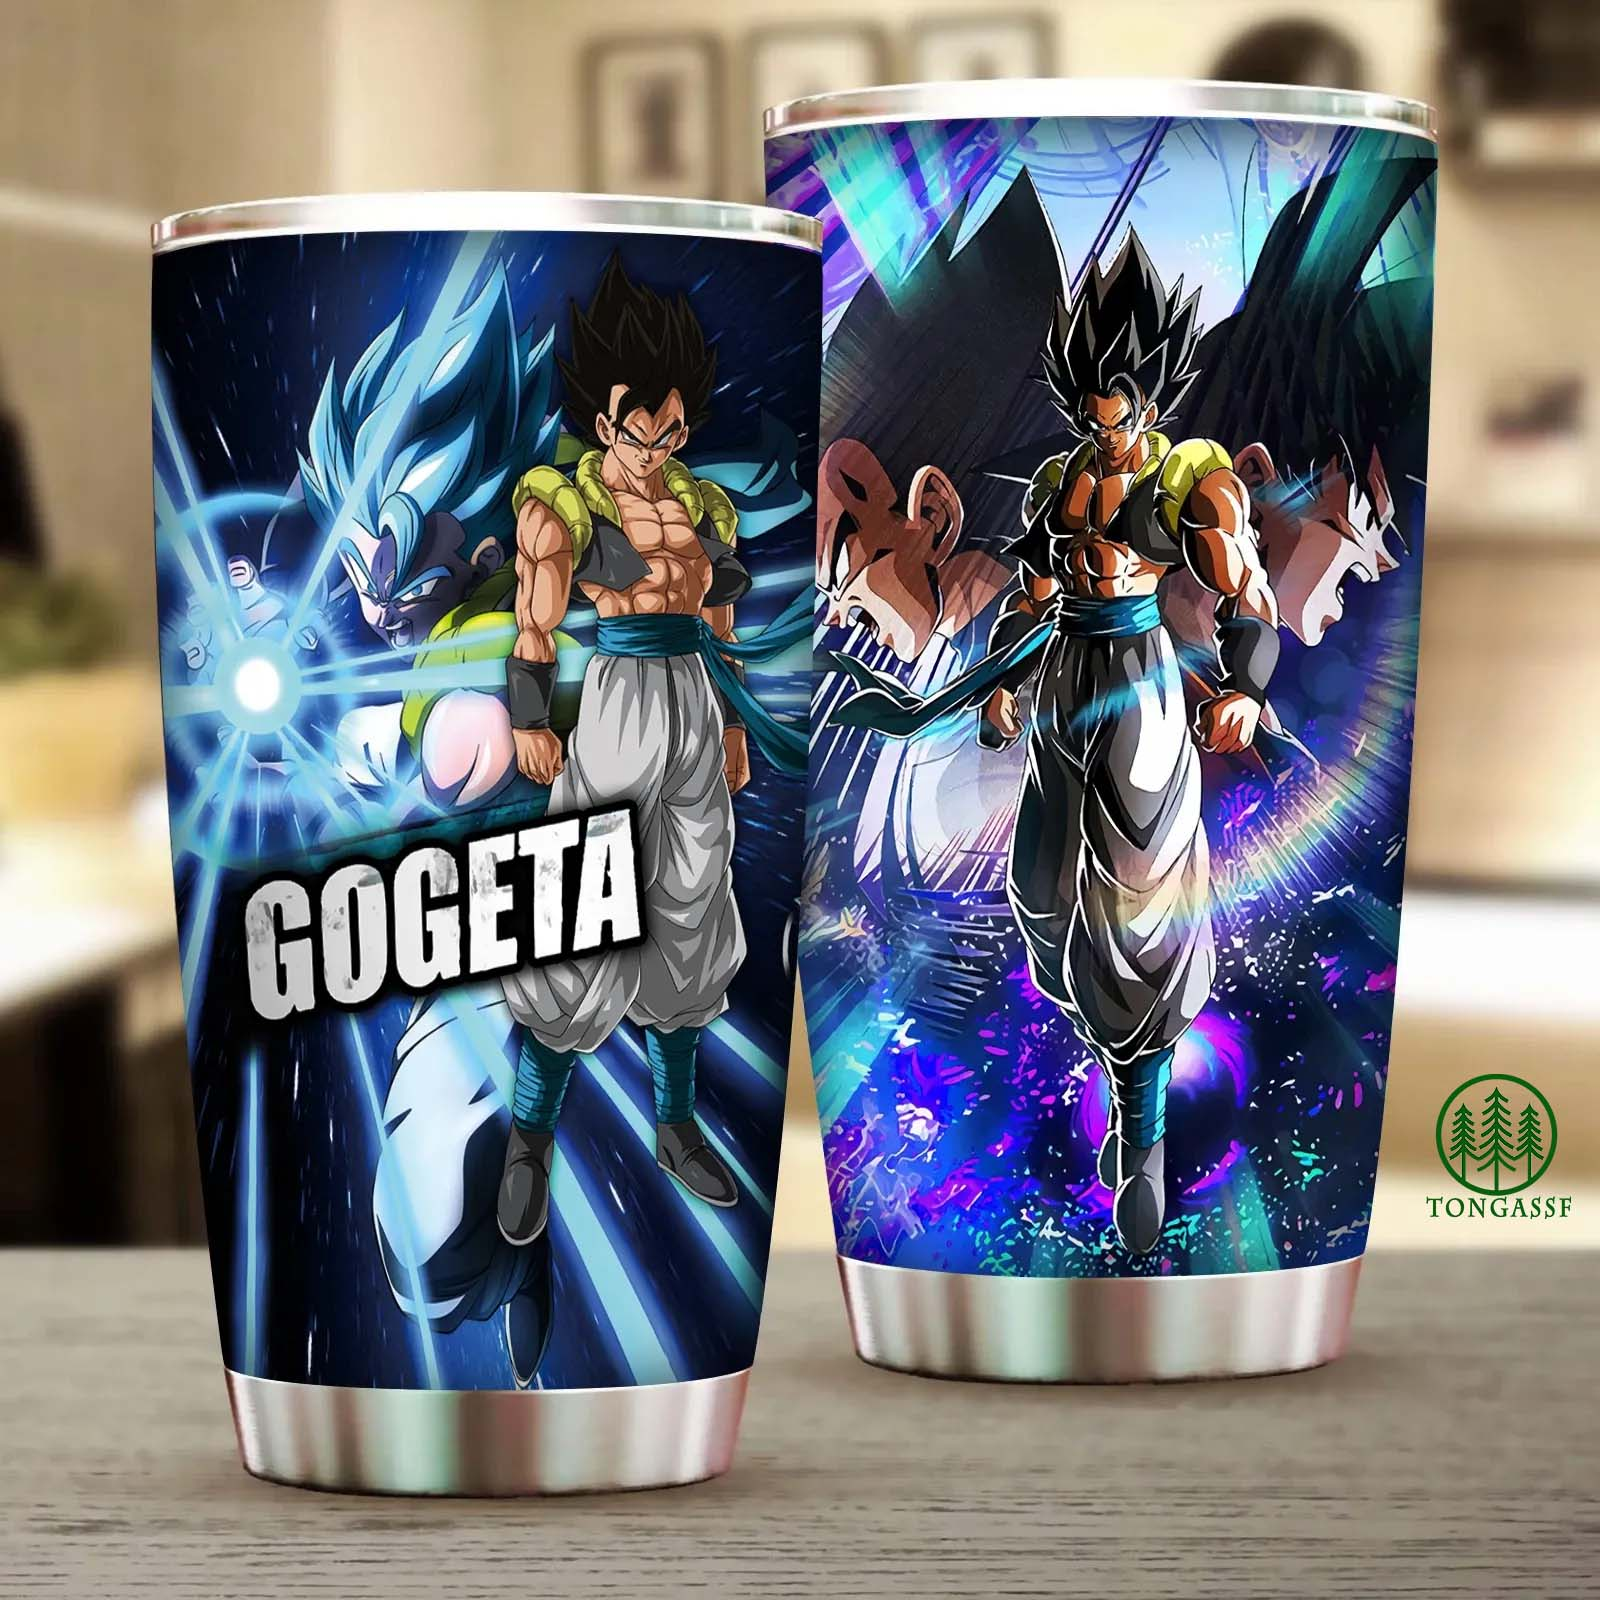 Dragon Ball Gogeta Tumbler